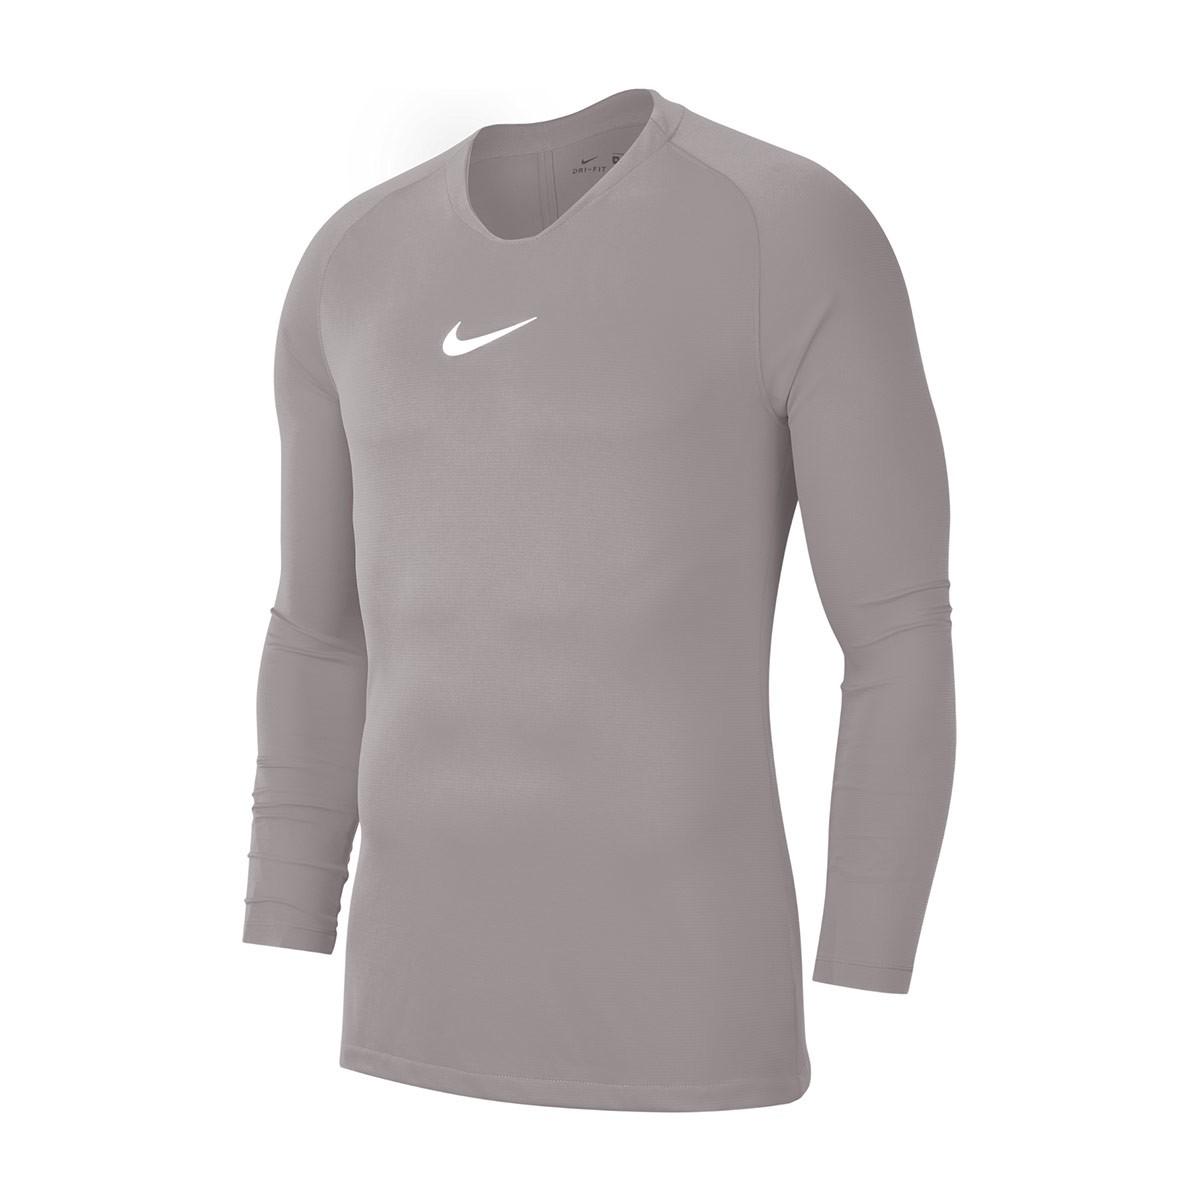 2122f2648e Camiseta Park First Layer m/l Niño Pewter grey